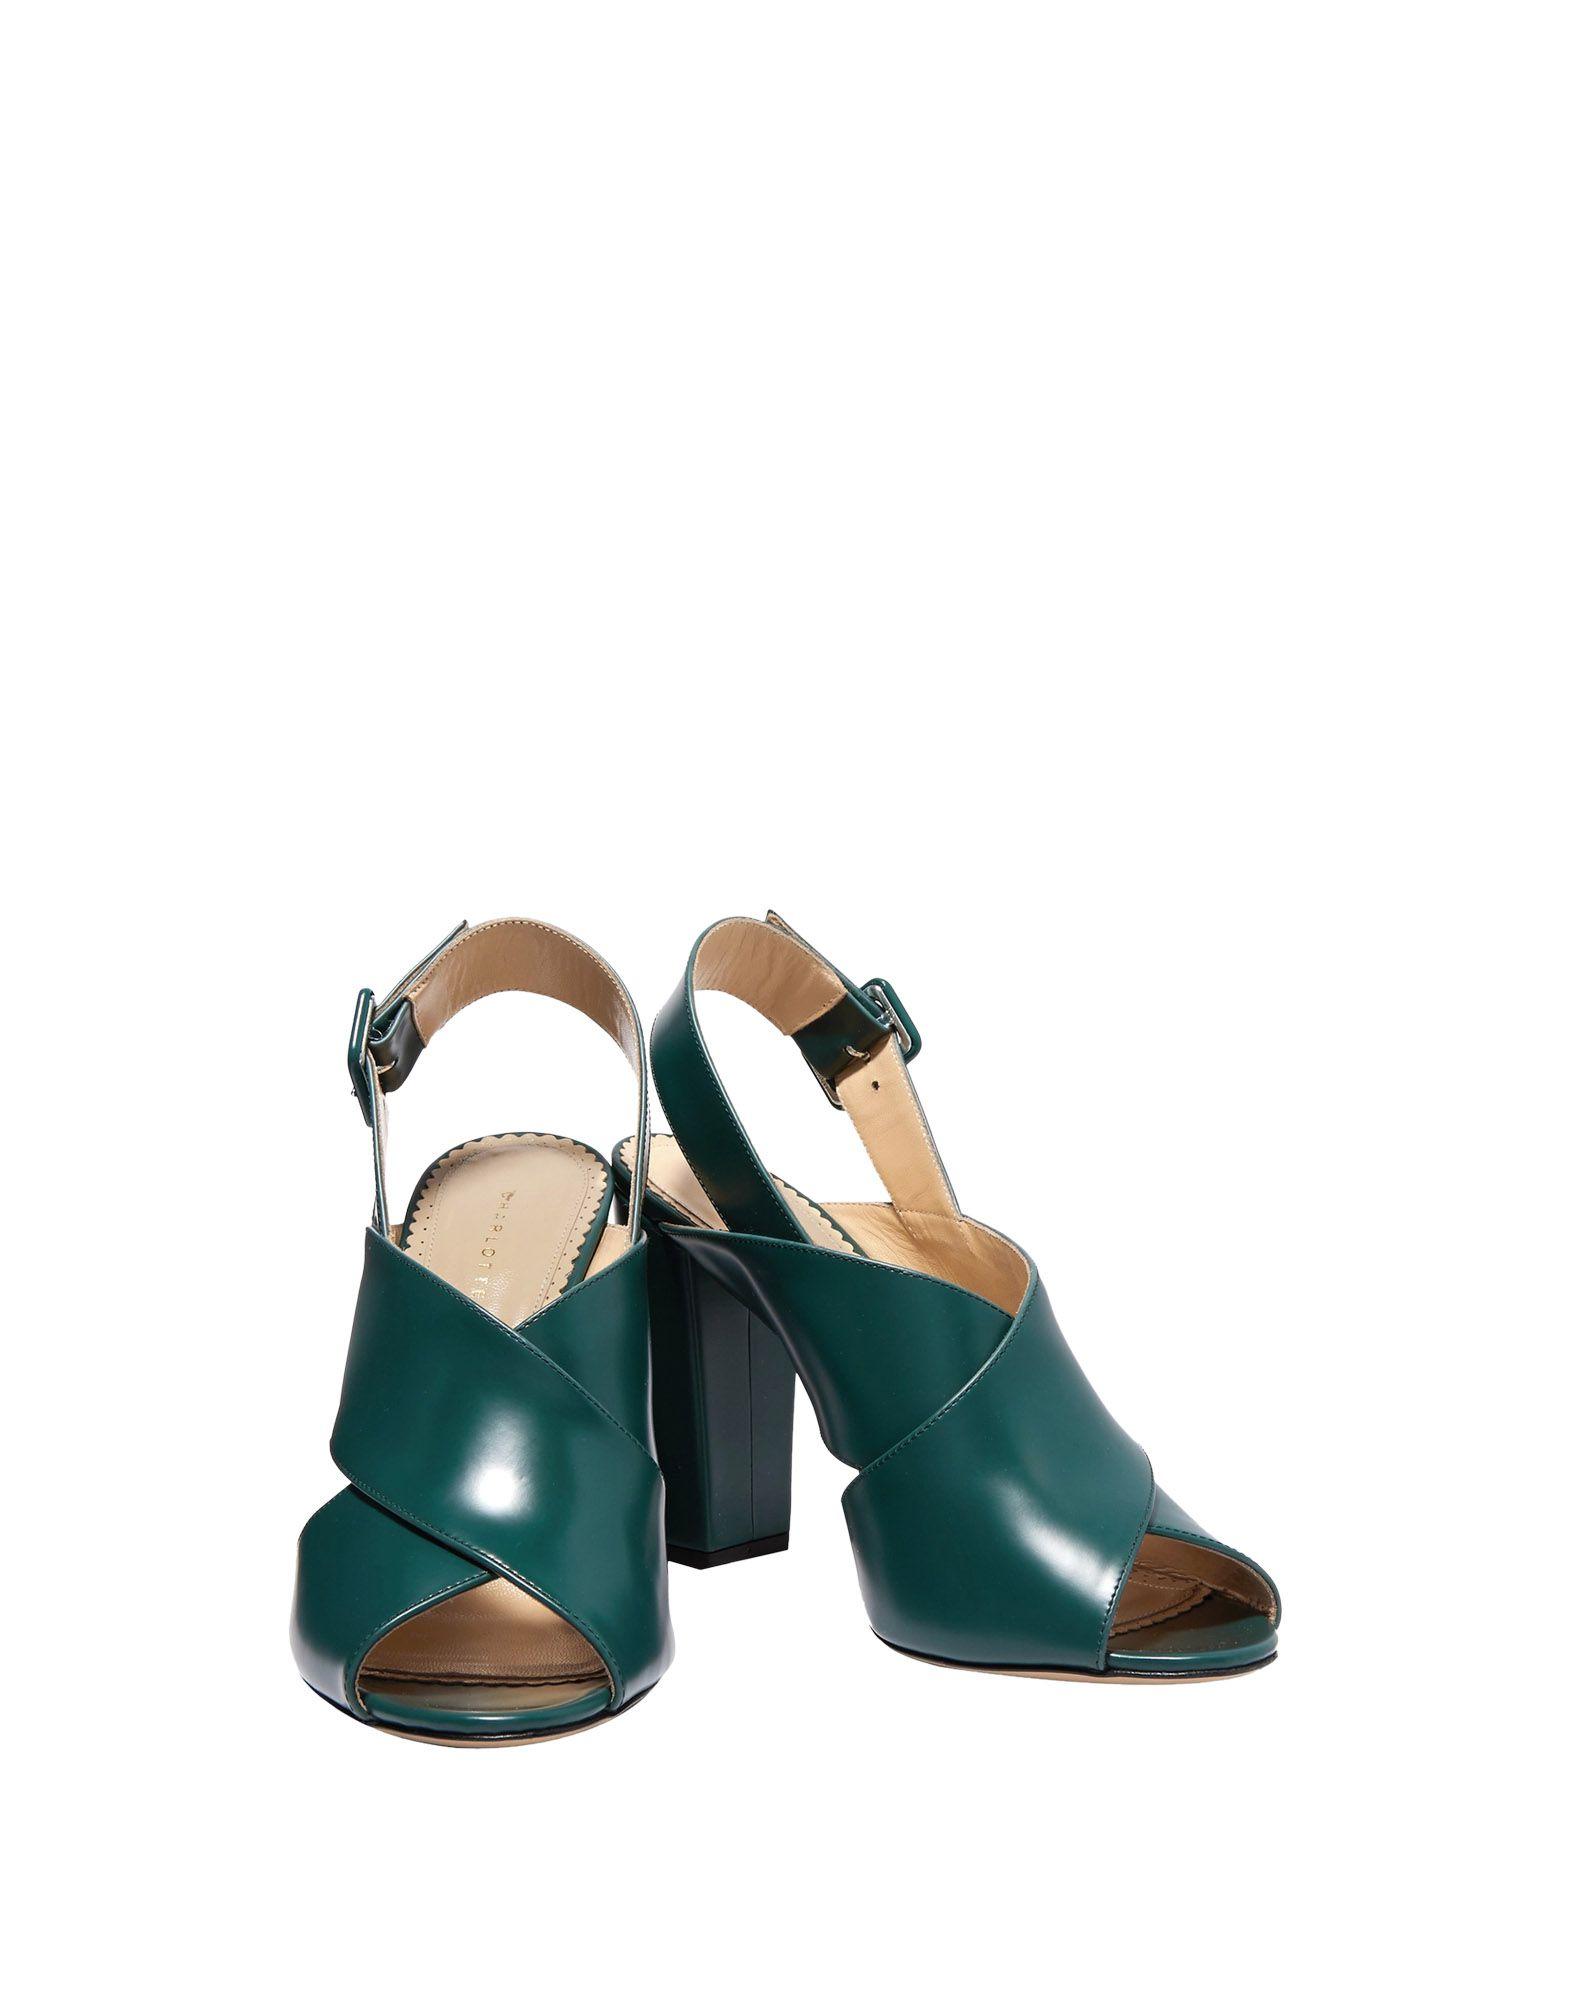 Charlotte Olympia Sandals Sandals - Women Charlotte Olympia Sandals Sandals online on  Australia - 11514722GQ 68c2f2